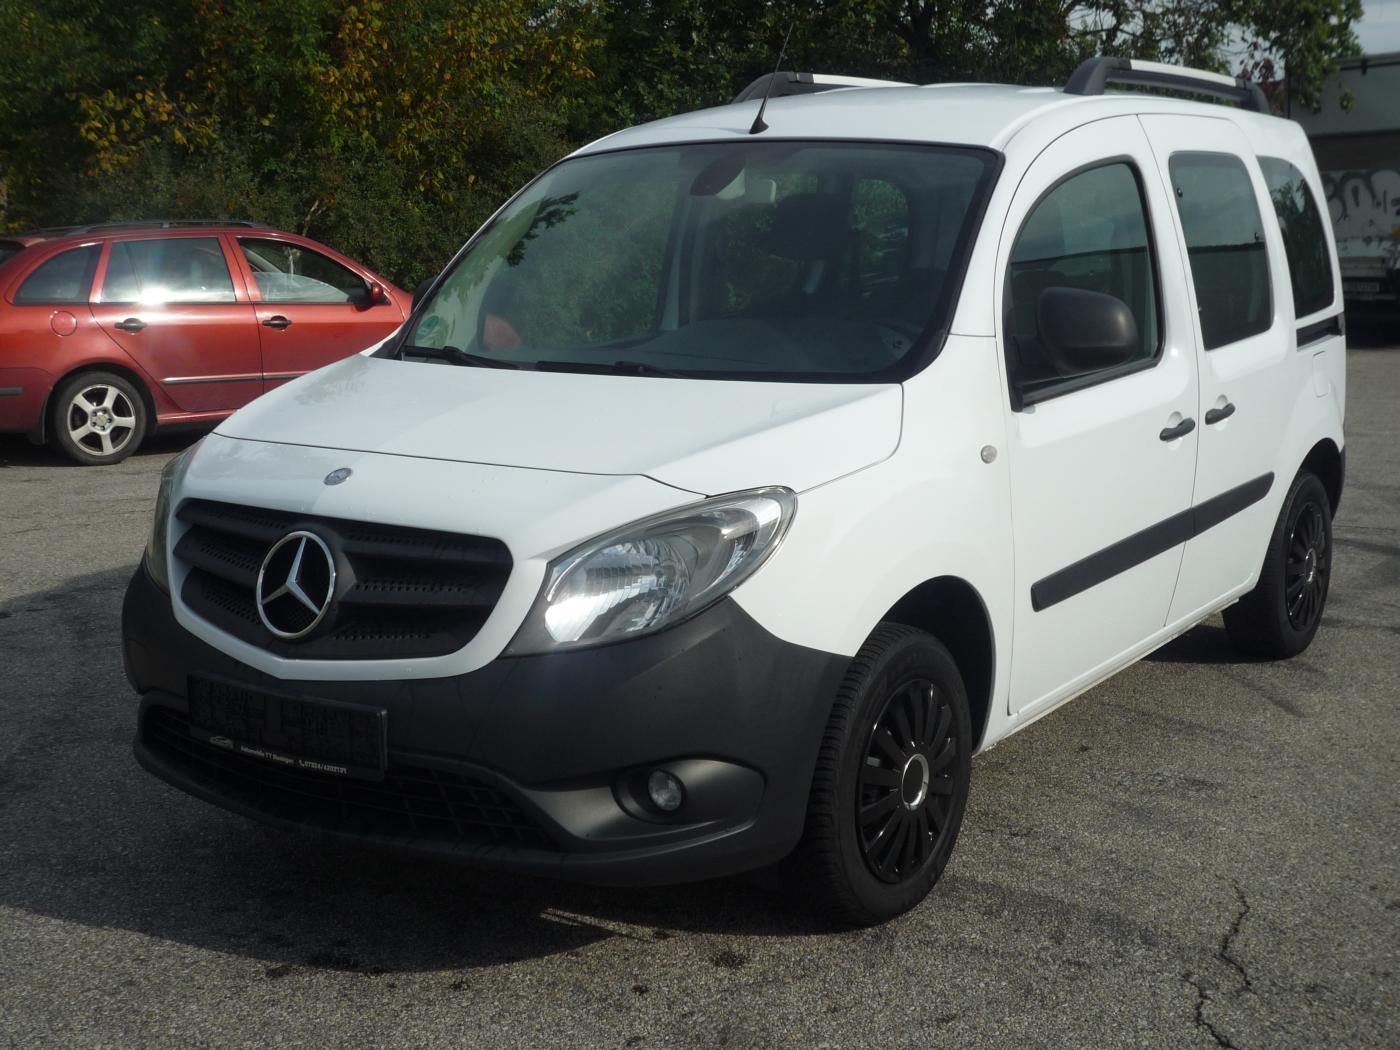 Mercedes-Benz Citan 1.5CDi 66kW,Klima,Výhřev,5sed VAN